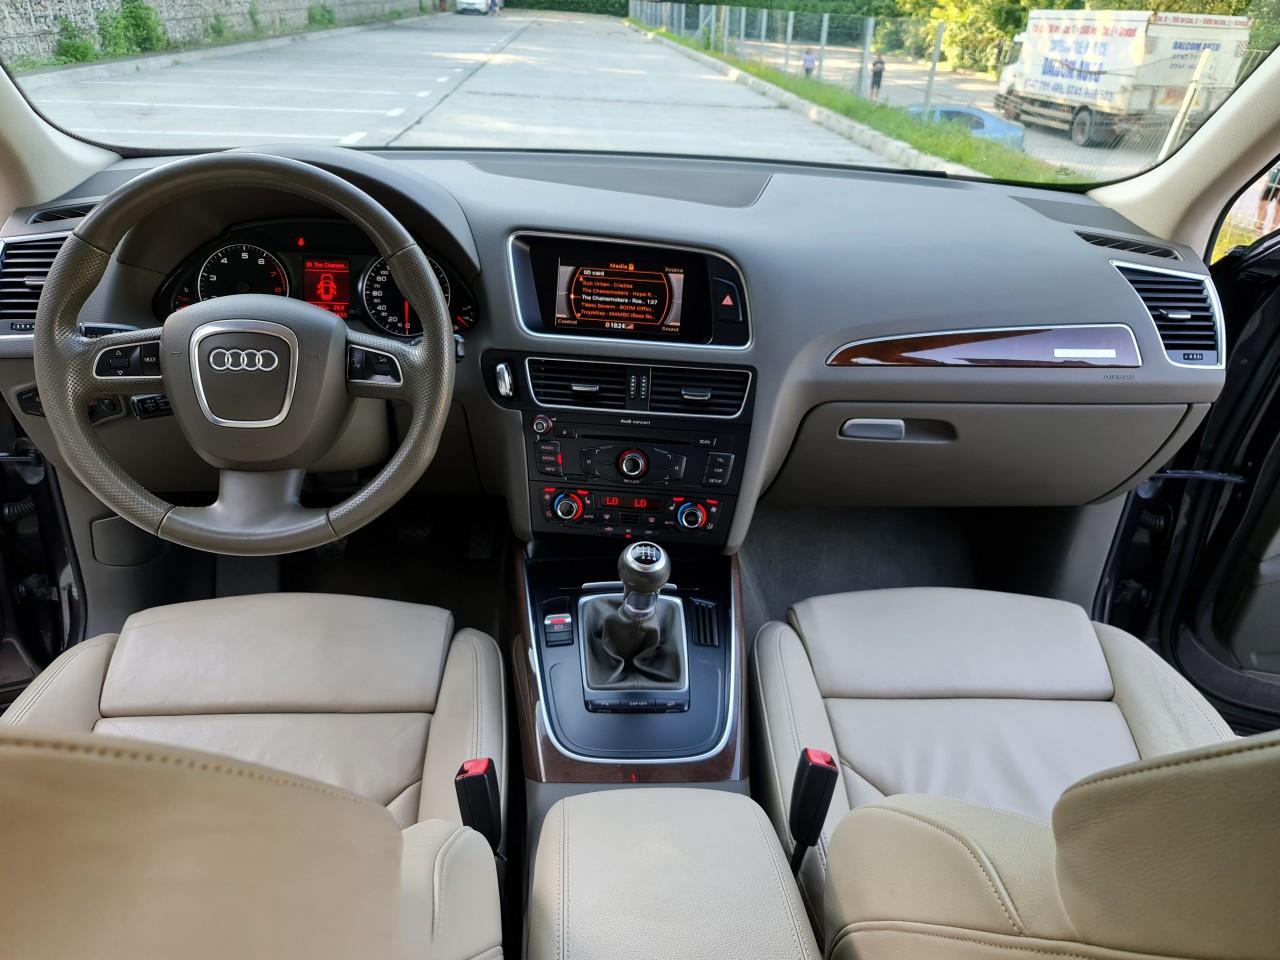 Audi Q5 Quattro Full options LED Bi-xenon piele climatronic pilot automat fab. 2010